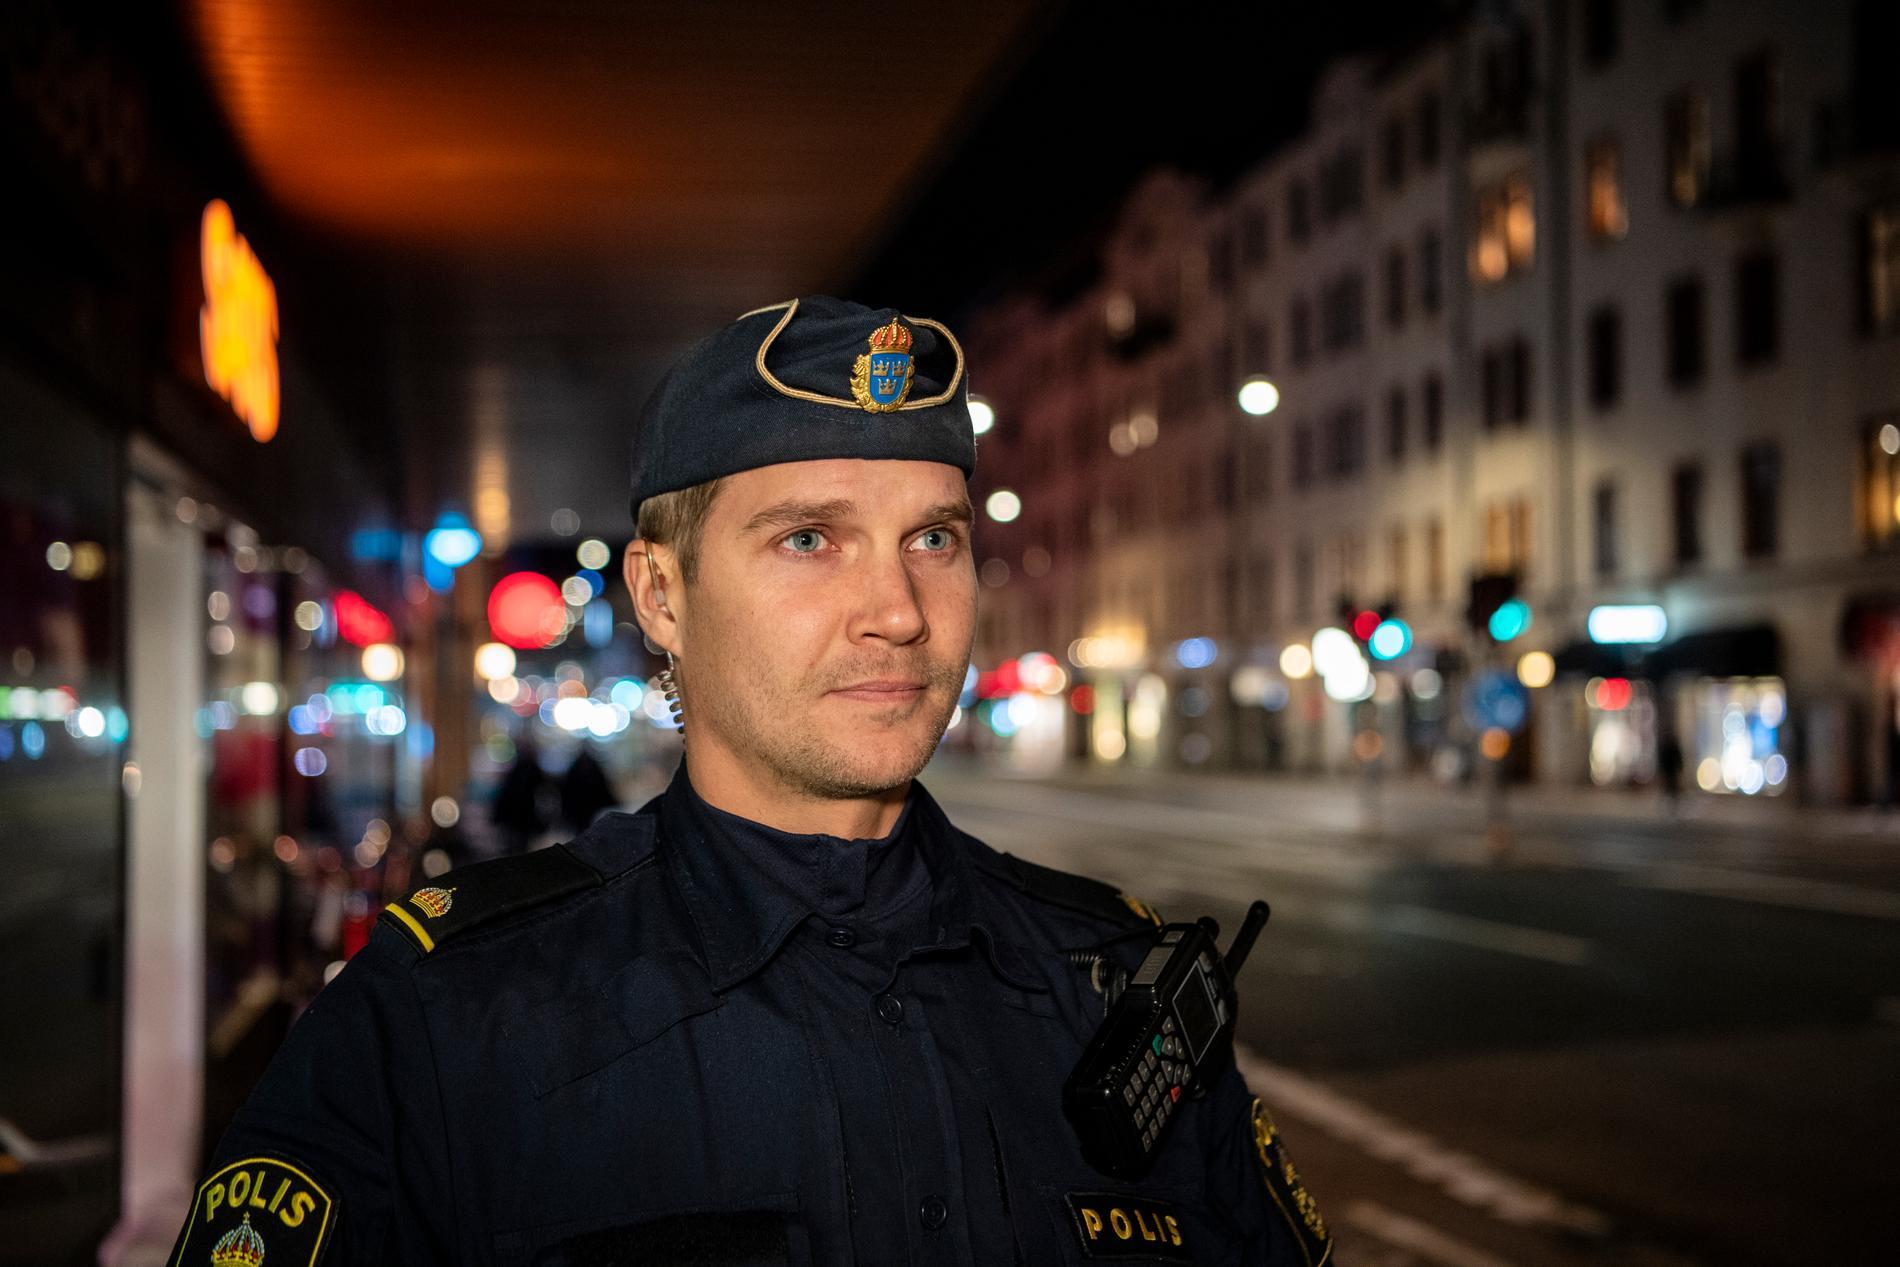 Ted Eriksson på Norrmalmspolisen under en tidigare insats.